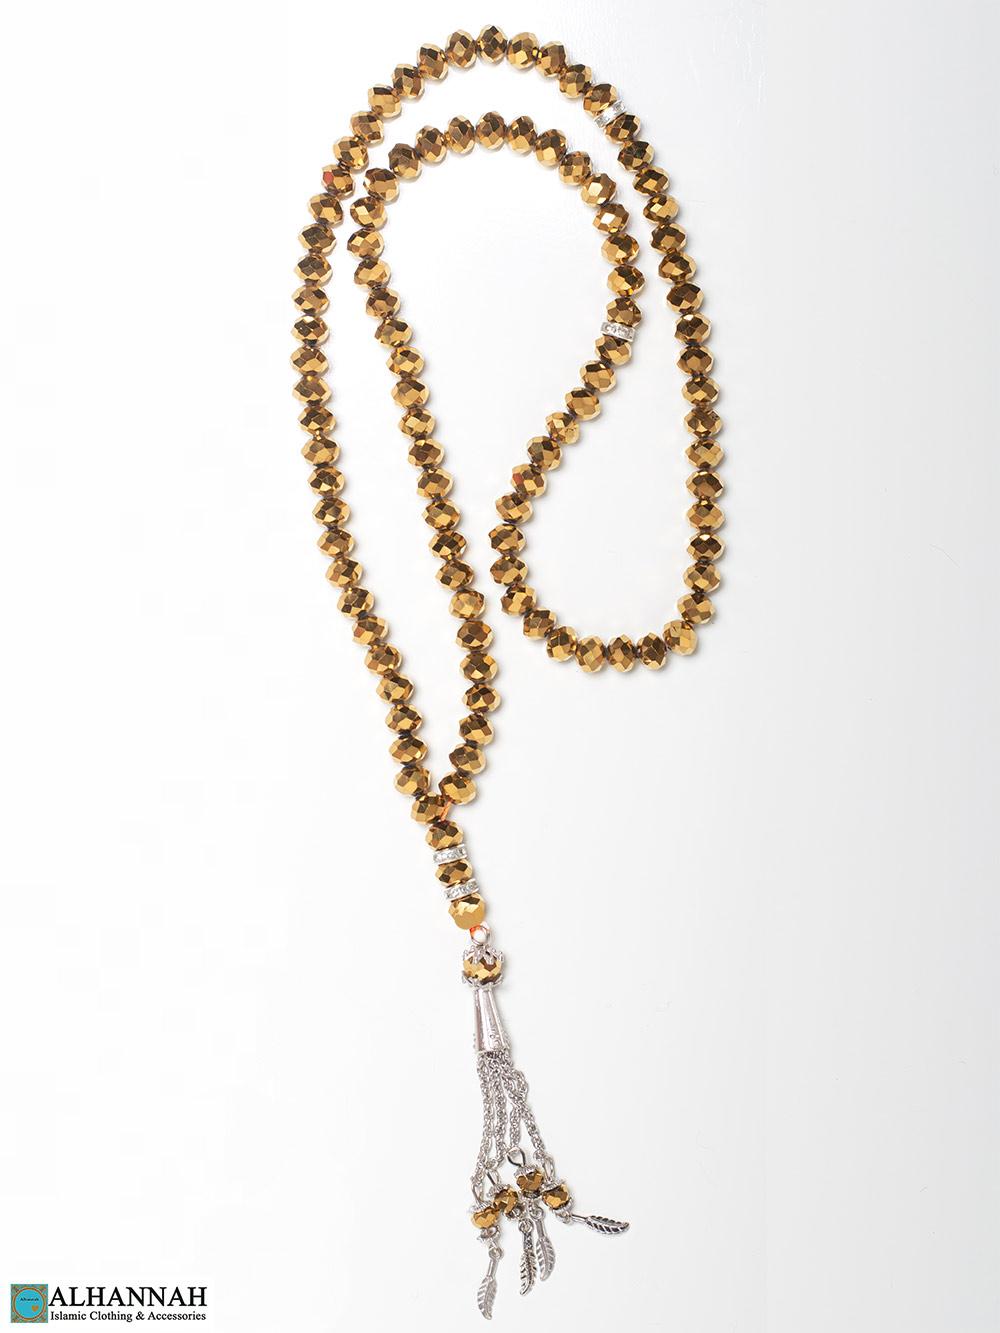 Metallic Crystal Prayer Beads 99 Beads Gold Tone